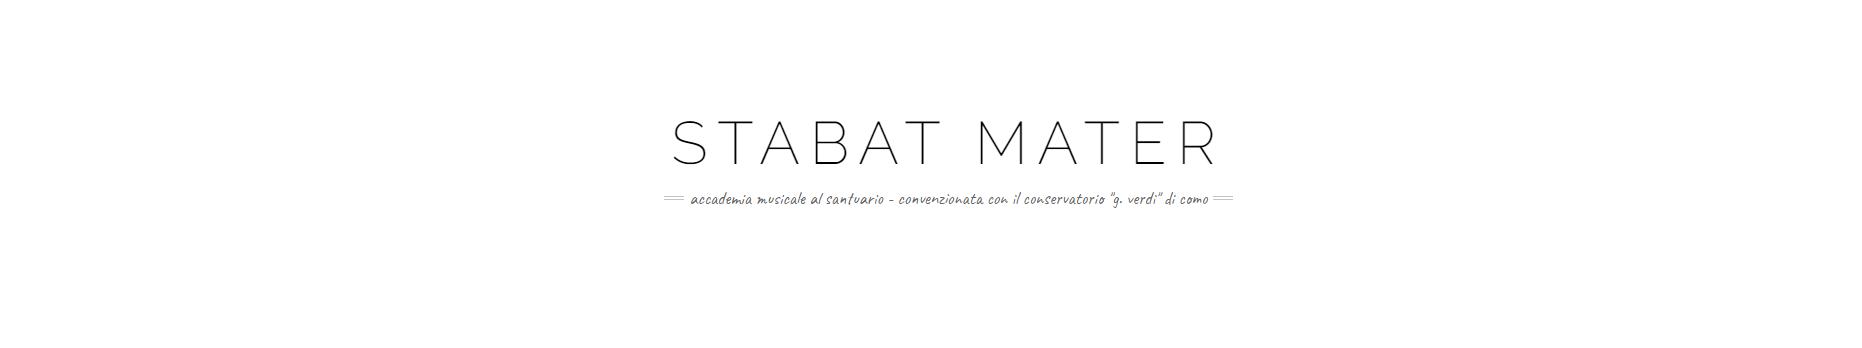 Associazione STABAT MATER - Accademia musicale al Santuario - logo